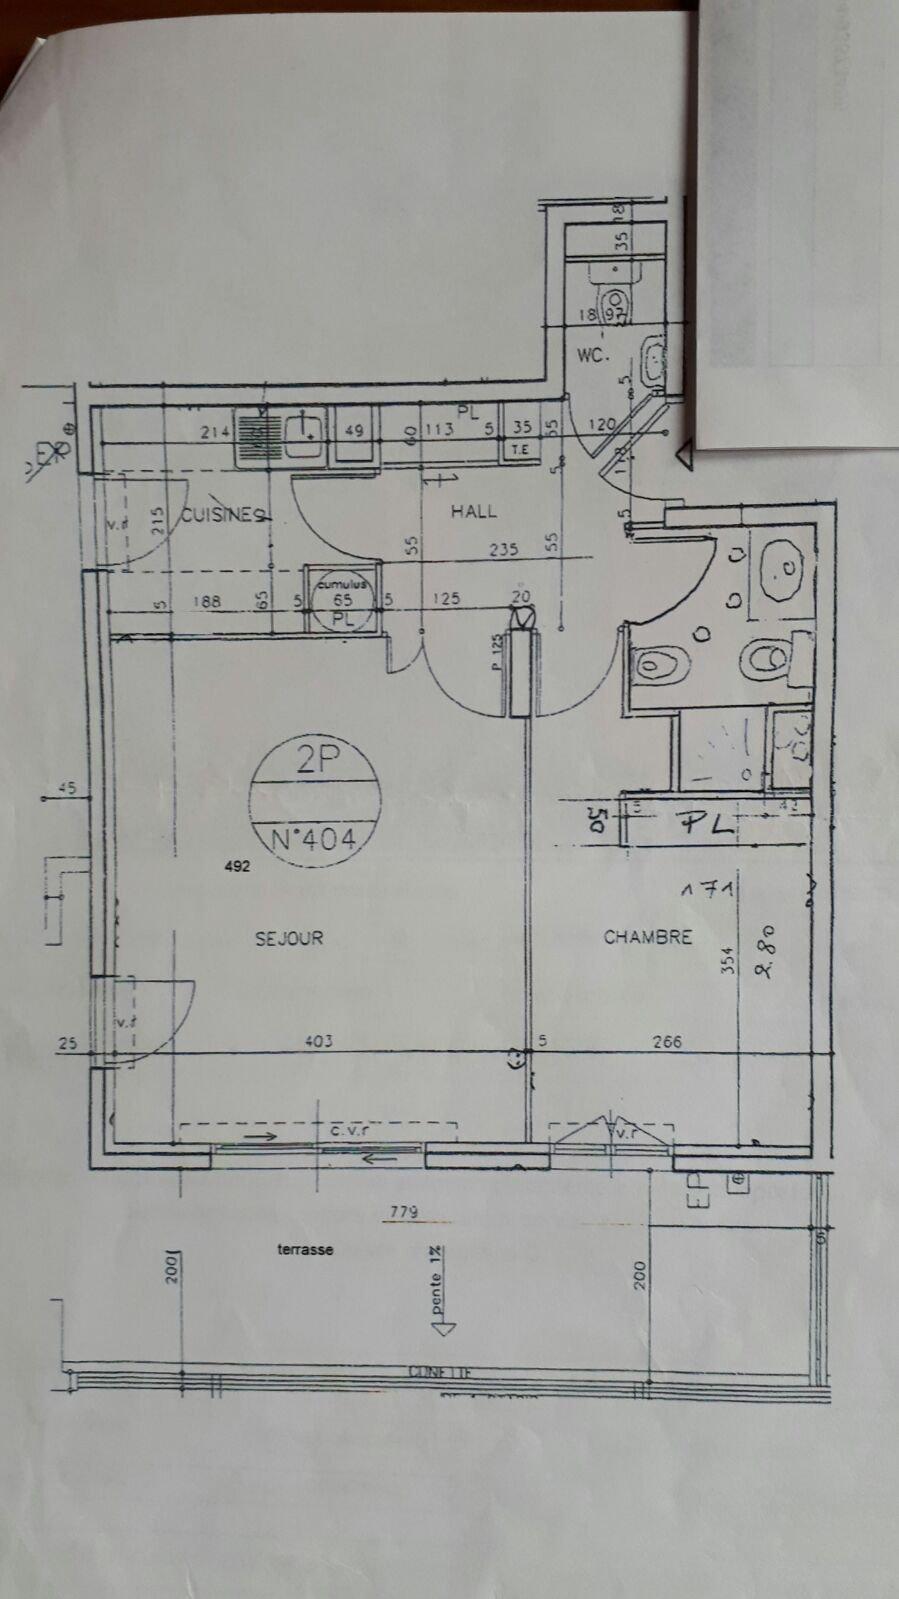 Продажа Апартаменты - Жюан-ле-Пен (Juan-les-Pins)